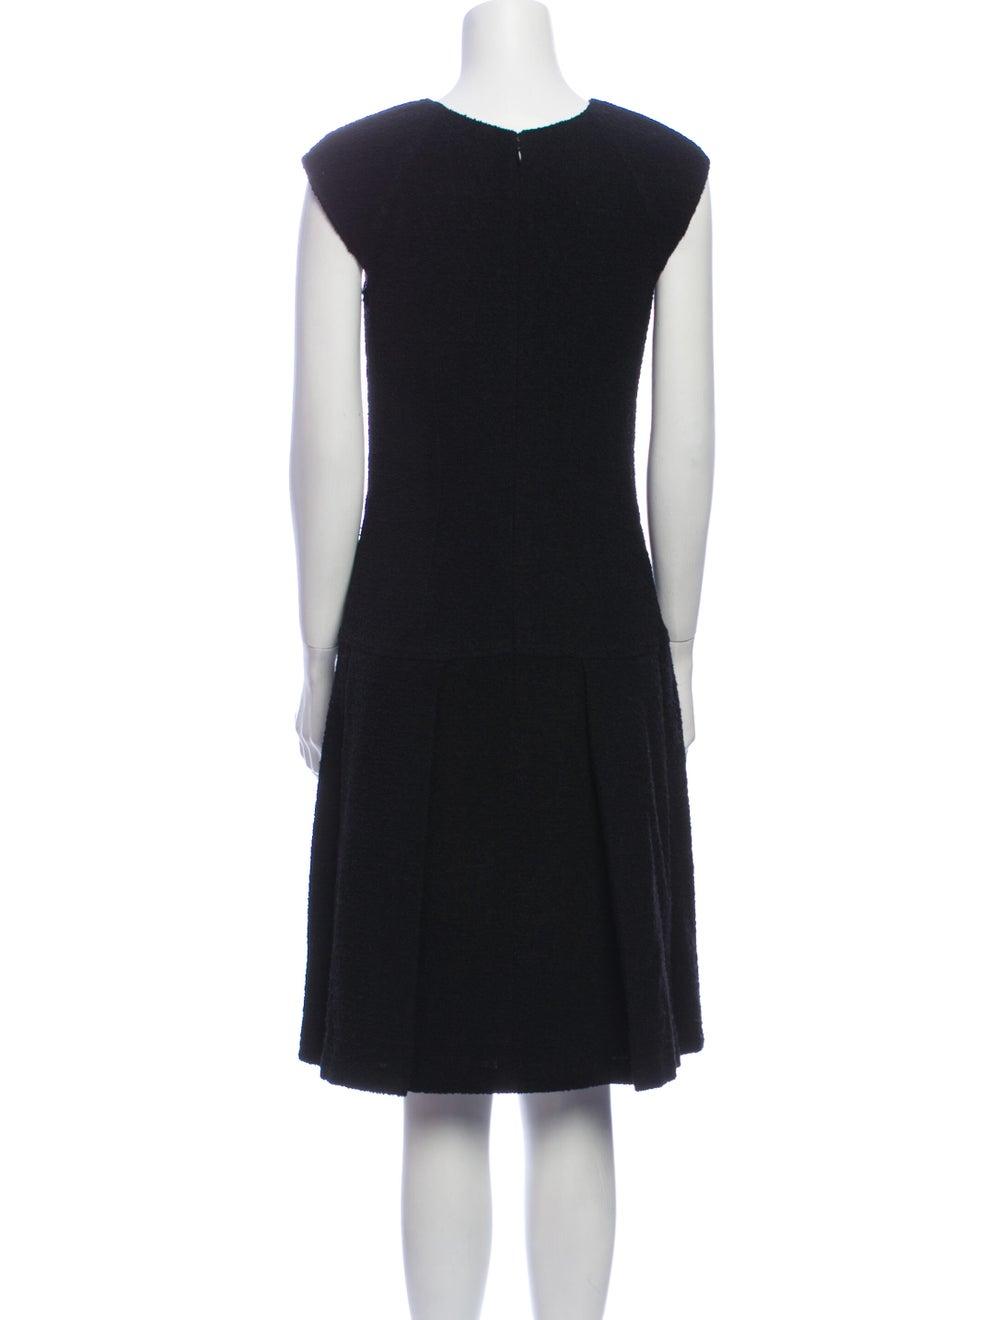 Oscar de la Renta 2008 Knee-Length Dress Black - image 3